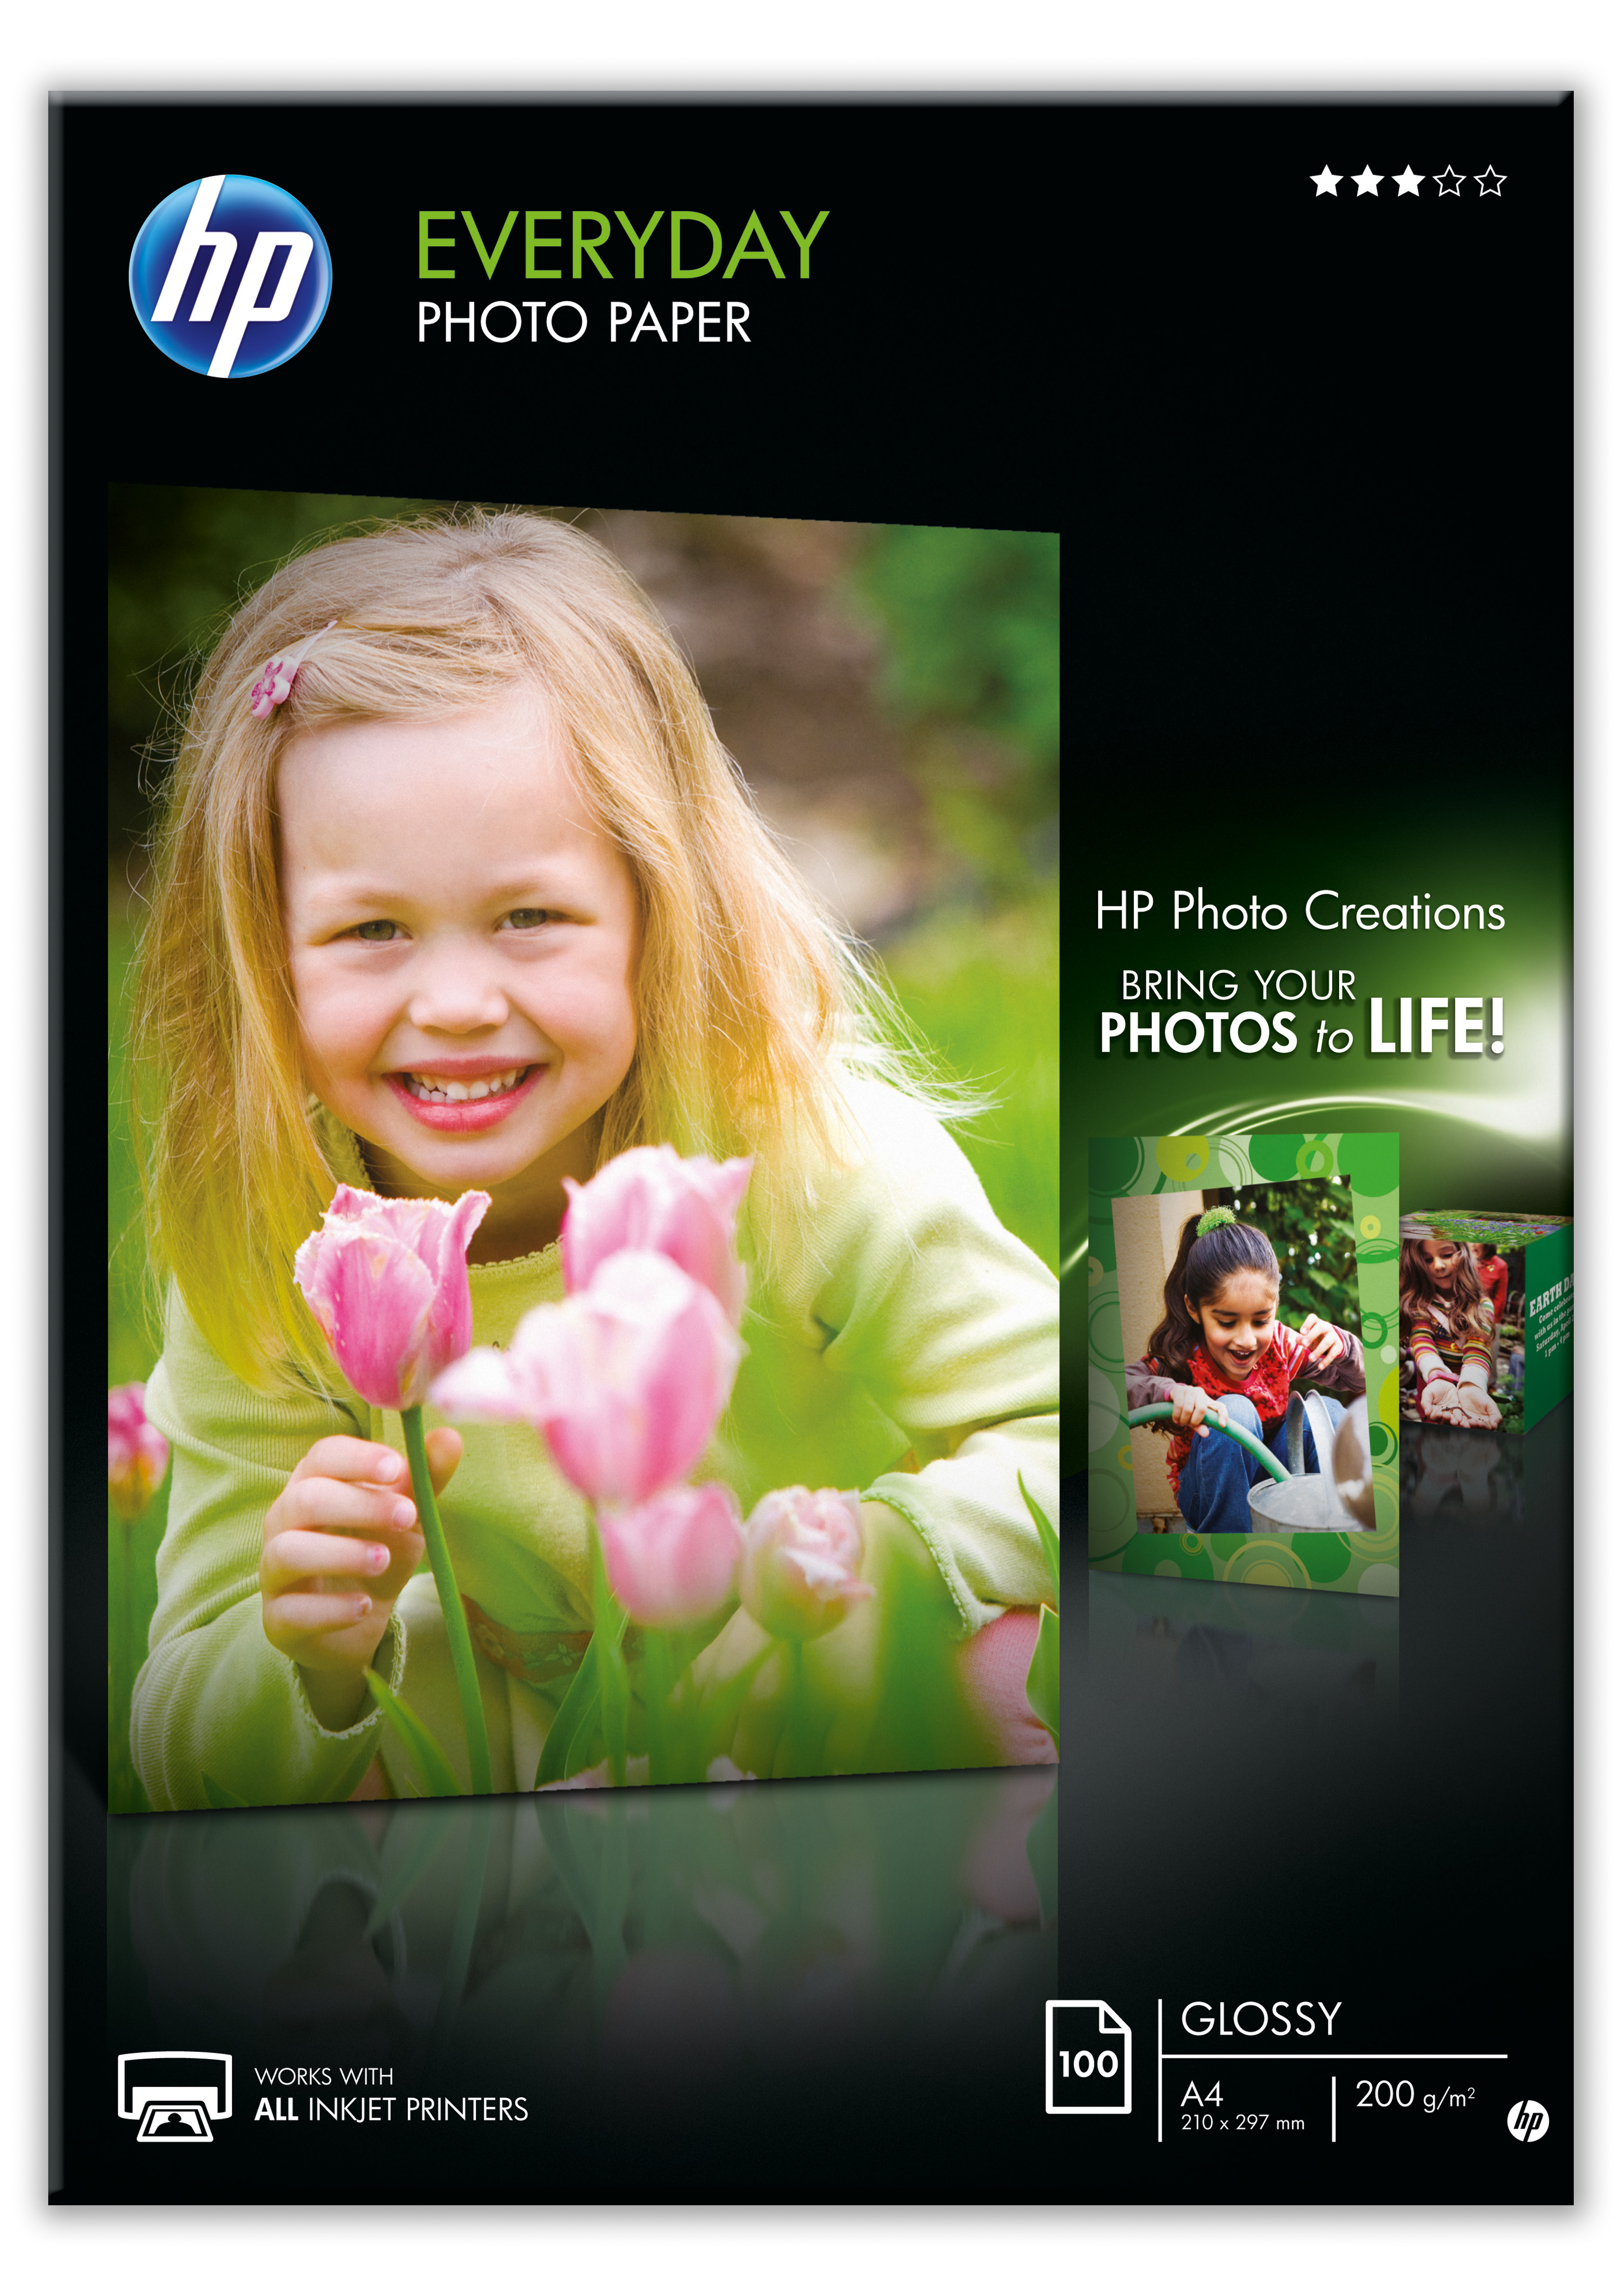 Papel fotográfico HP uso diario inkjet A4 100h